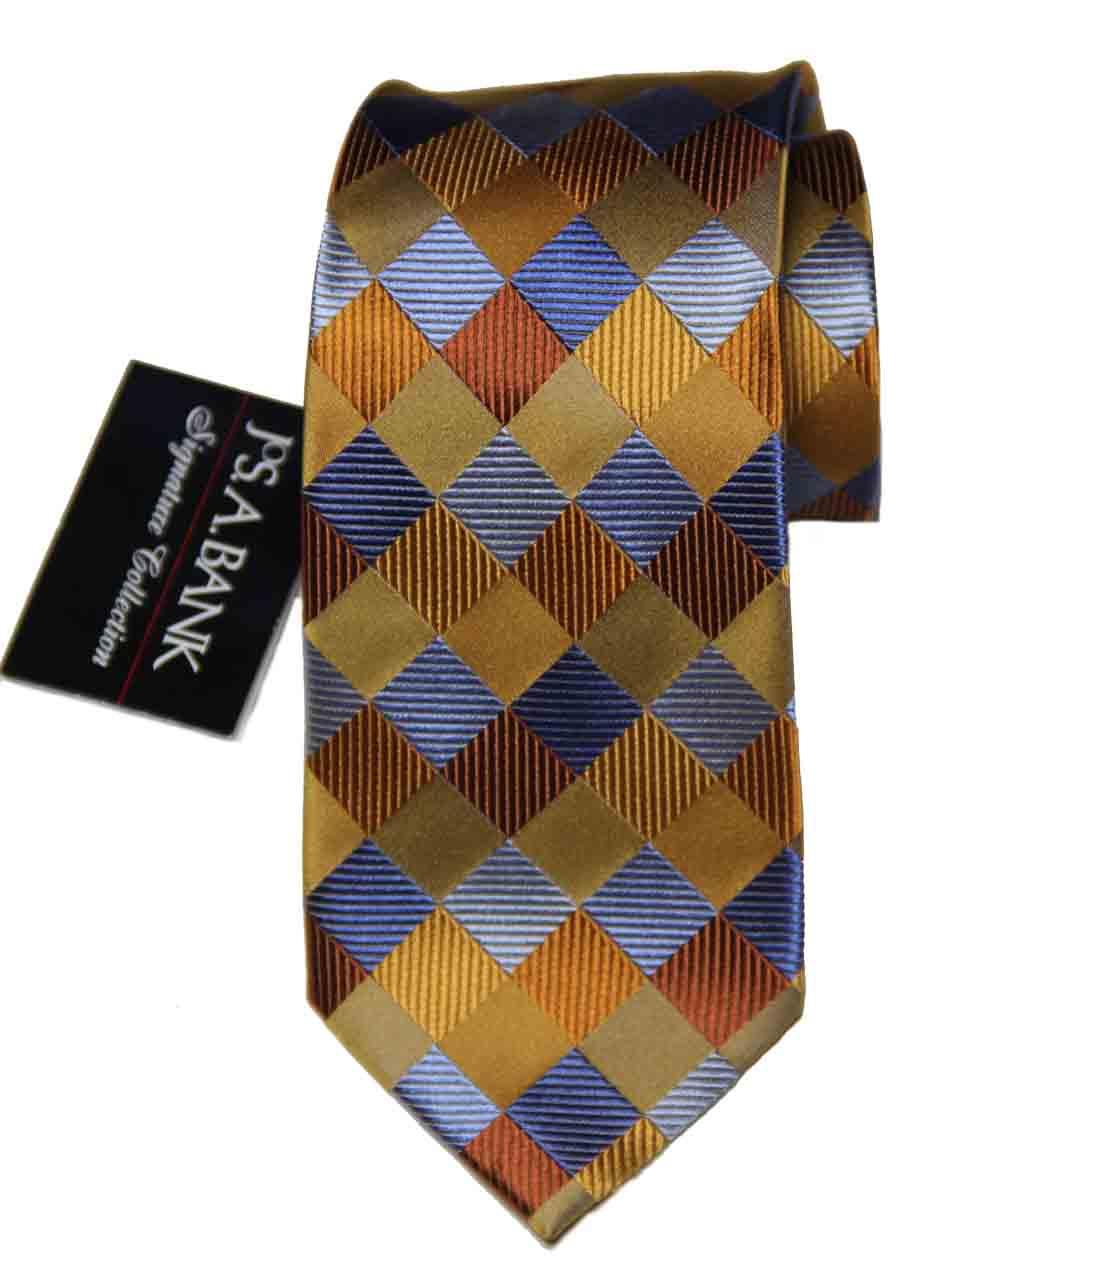 Jos A Bank Tie Silk Gold Blue Brown Gray Men's